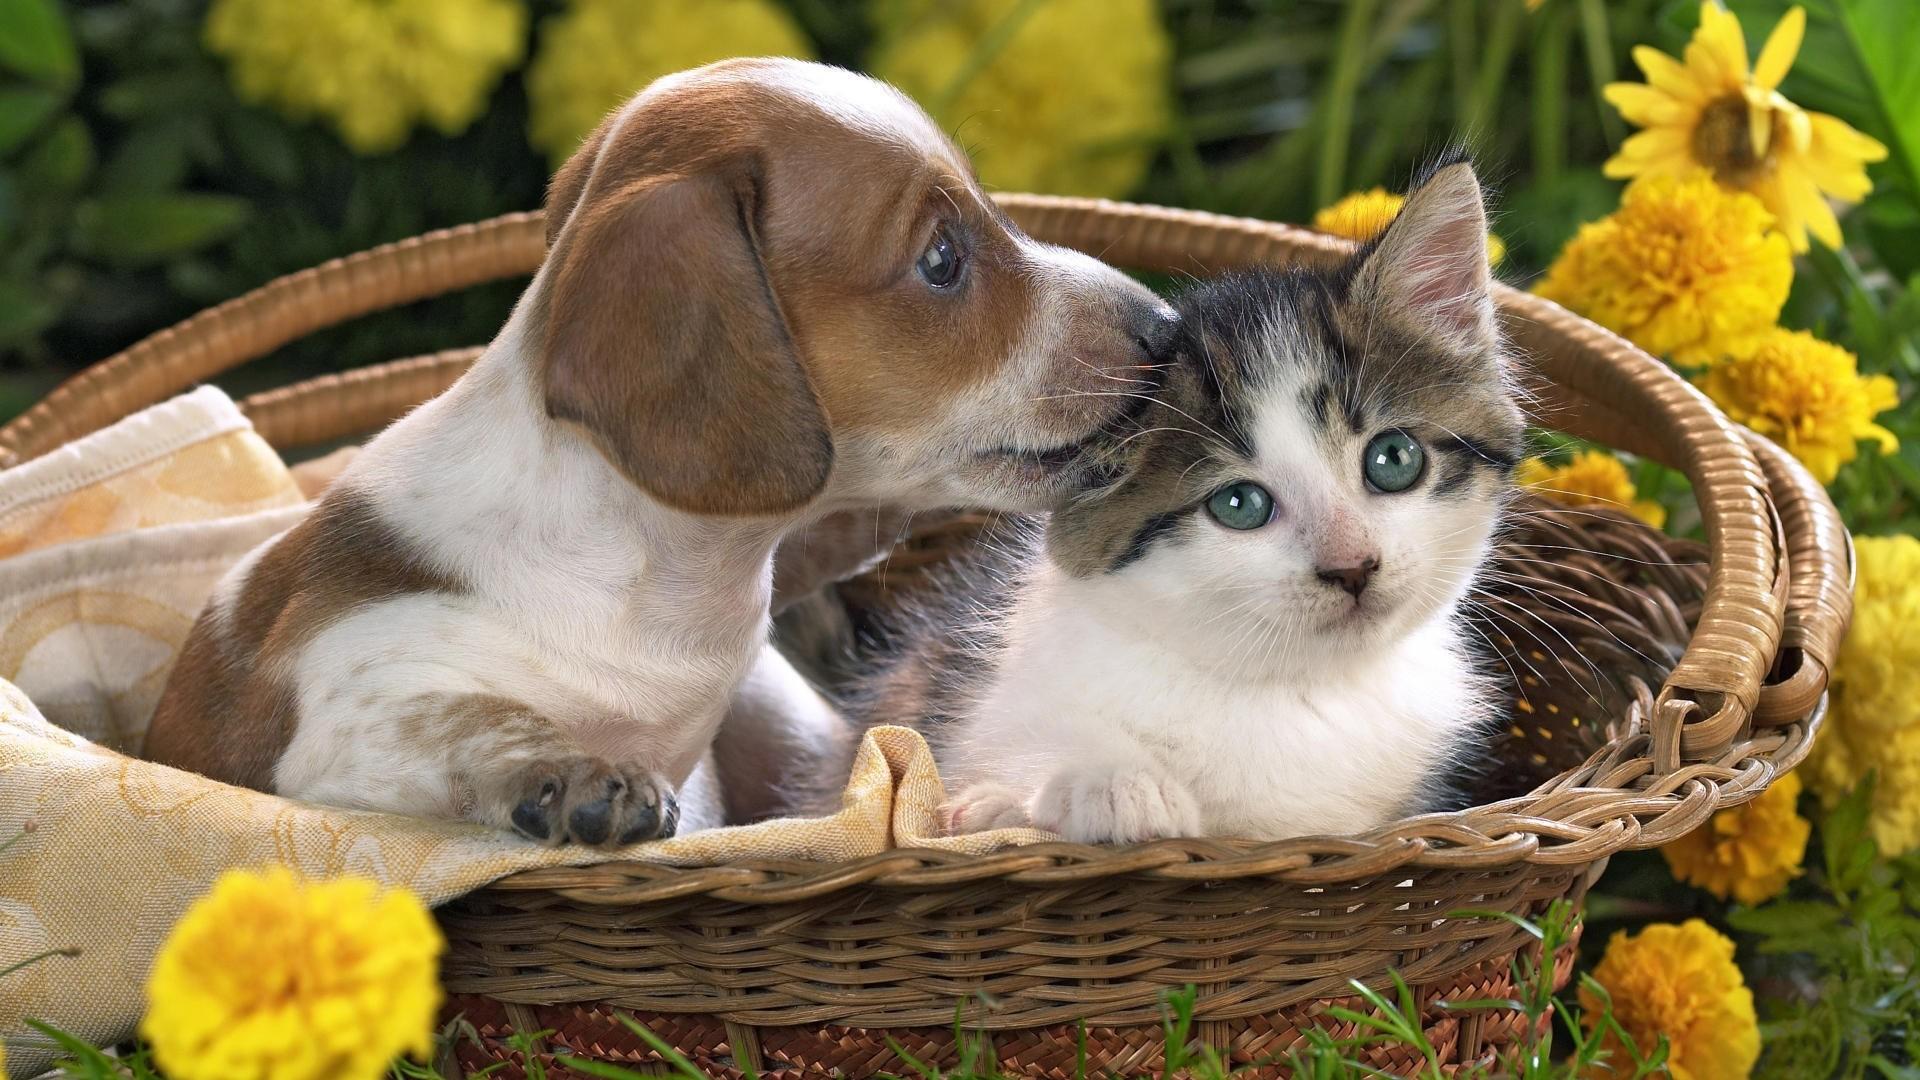 Preview wallpaper puppy, kitten, basket, flowers, friendship 1920×1080